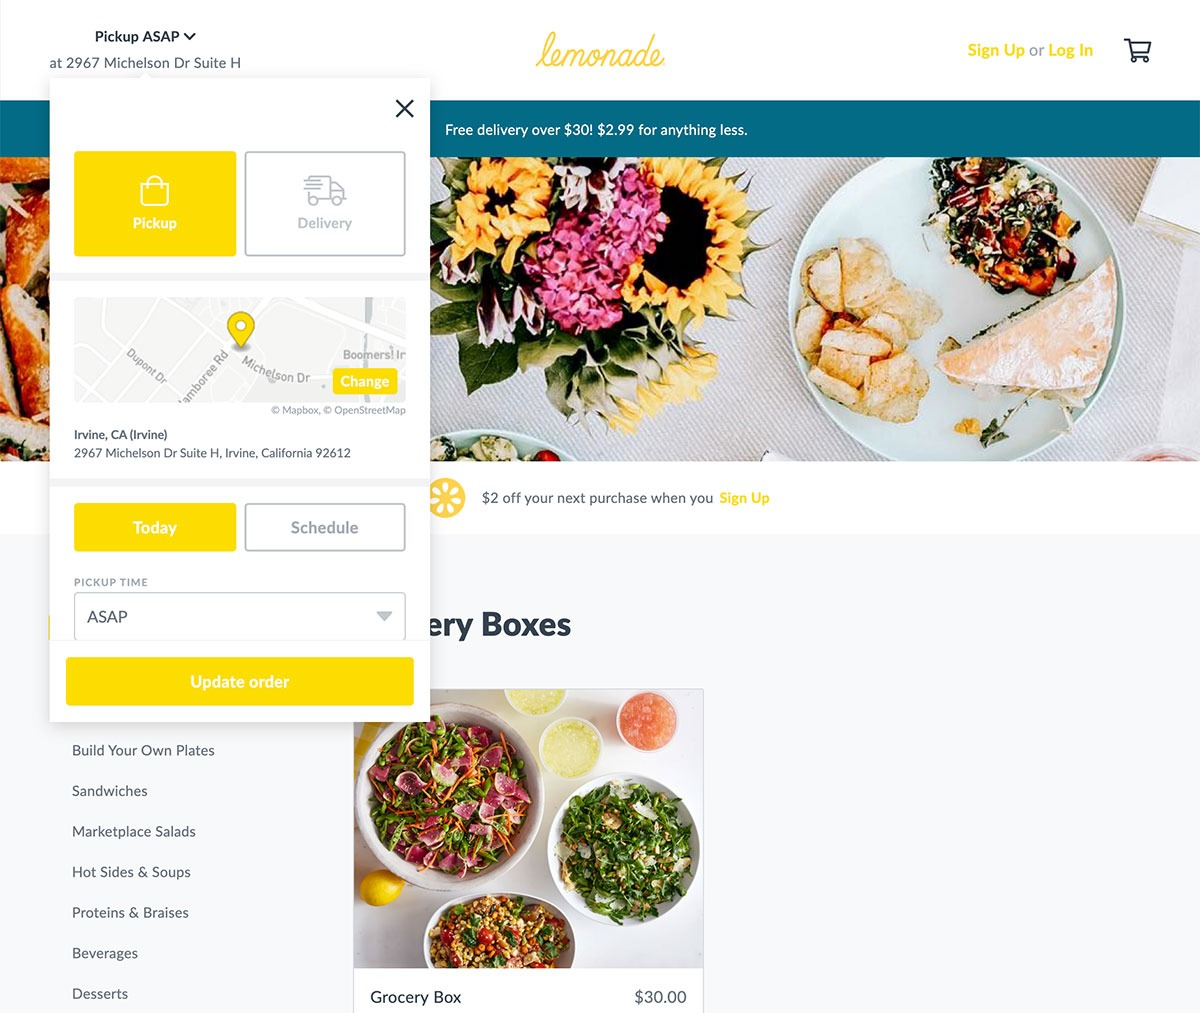 Lemonade desktop ordering experience via Thanx